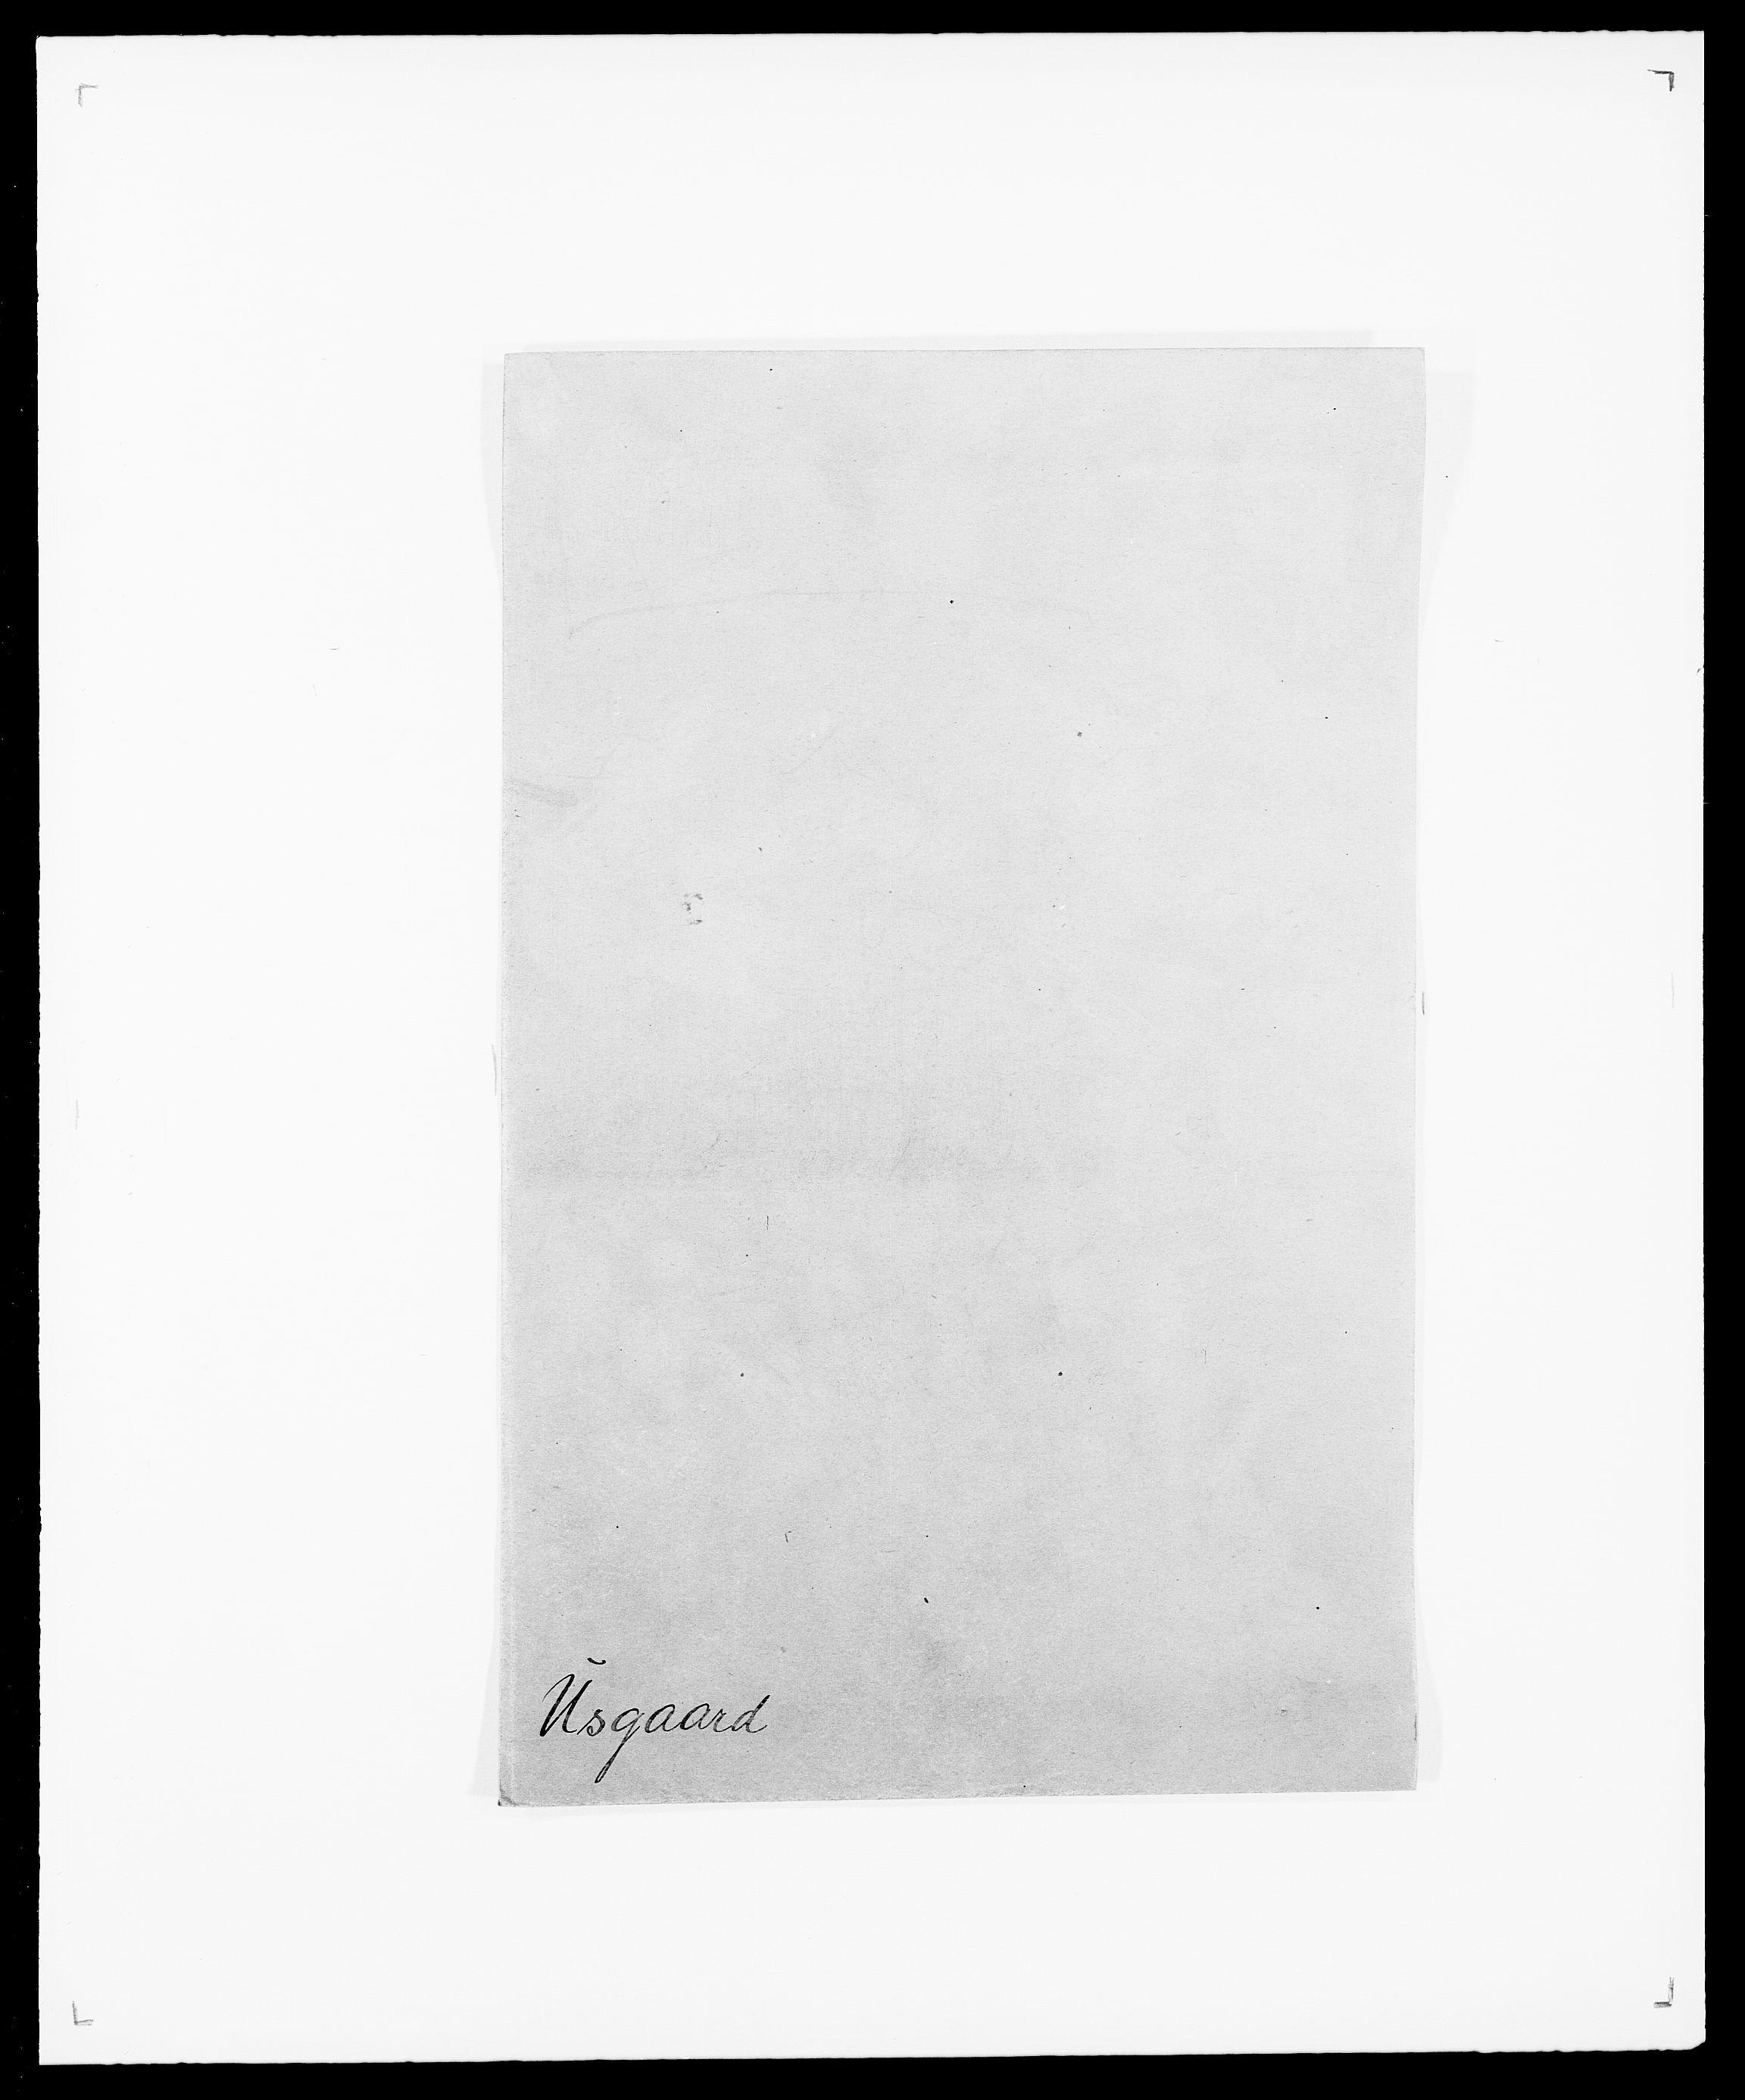 SAO, Delgobe, Charles Antoine - samling, D/Da/L0040: Usgaard - Velund, s. 1